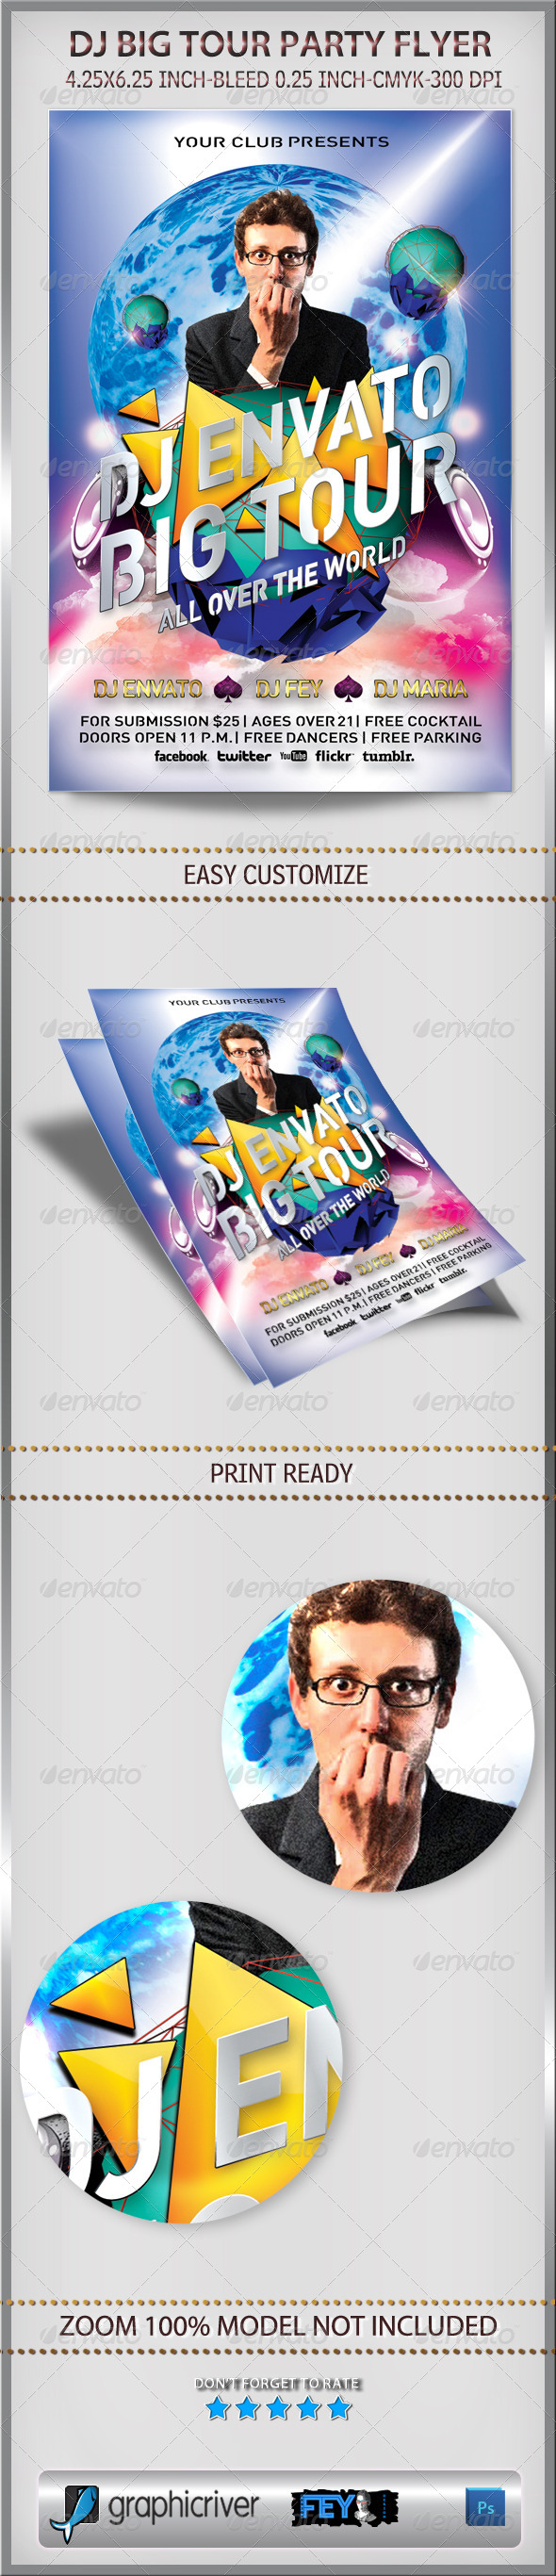 Dj Big Tour Party Flyer - Flyers Print Templates